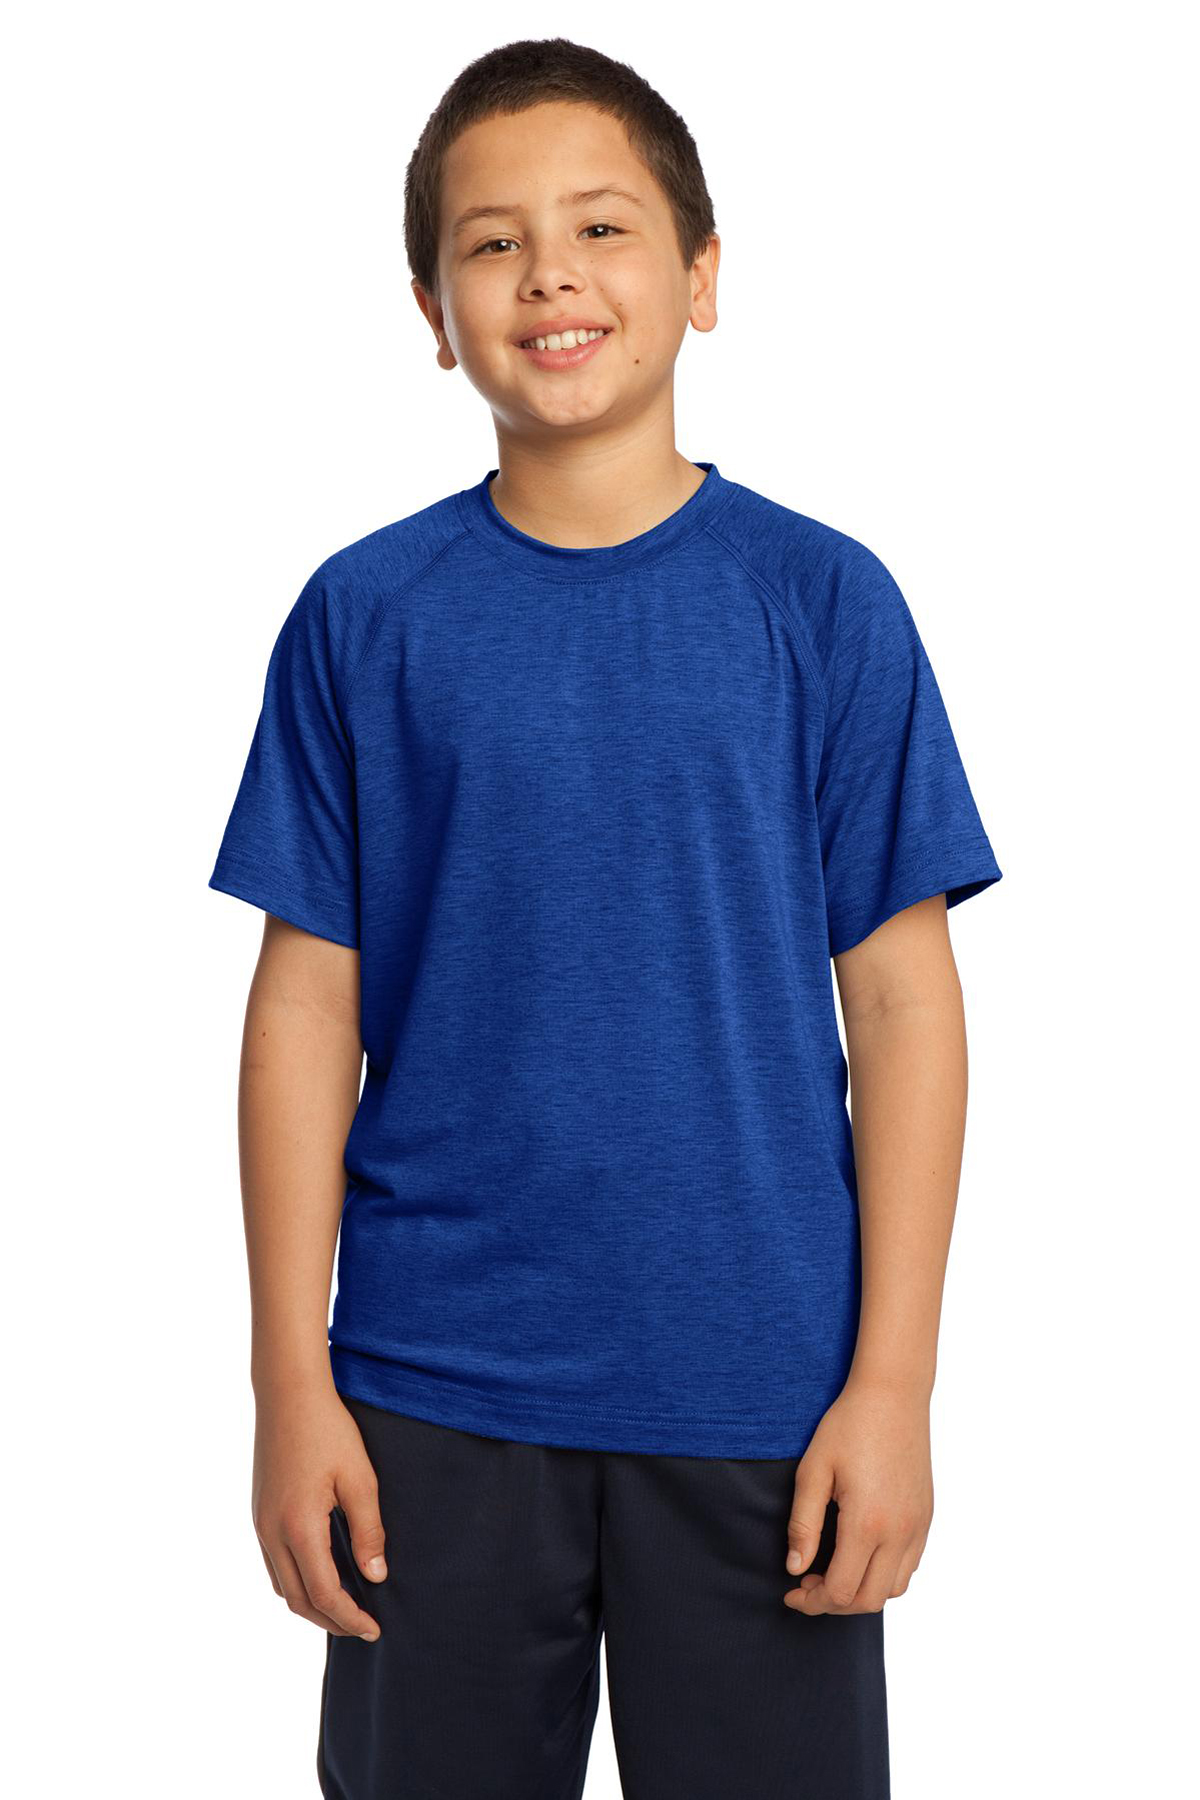 T-Shirts-Performance-48